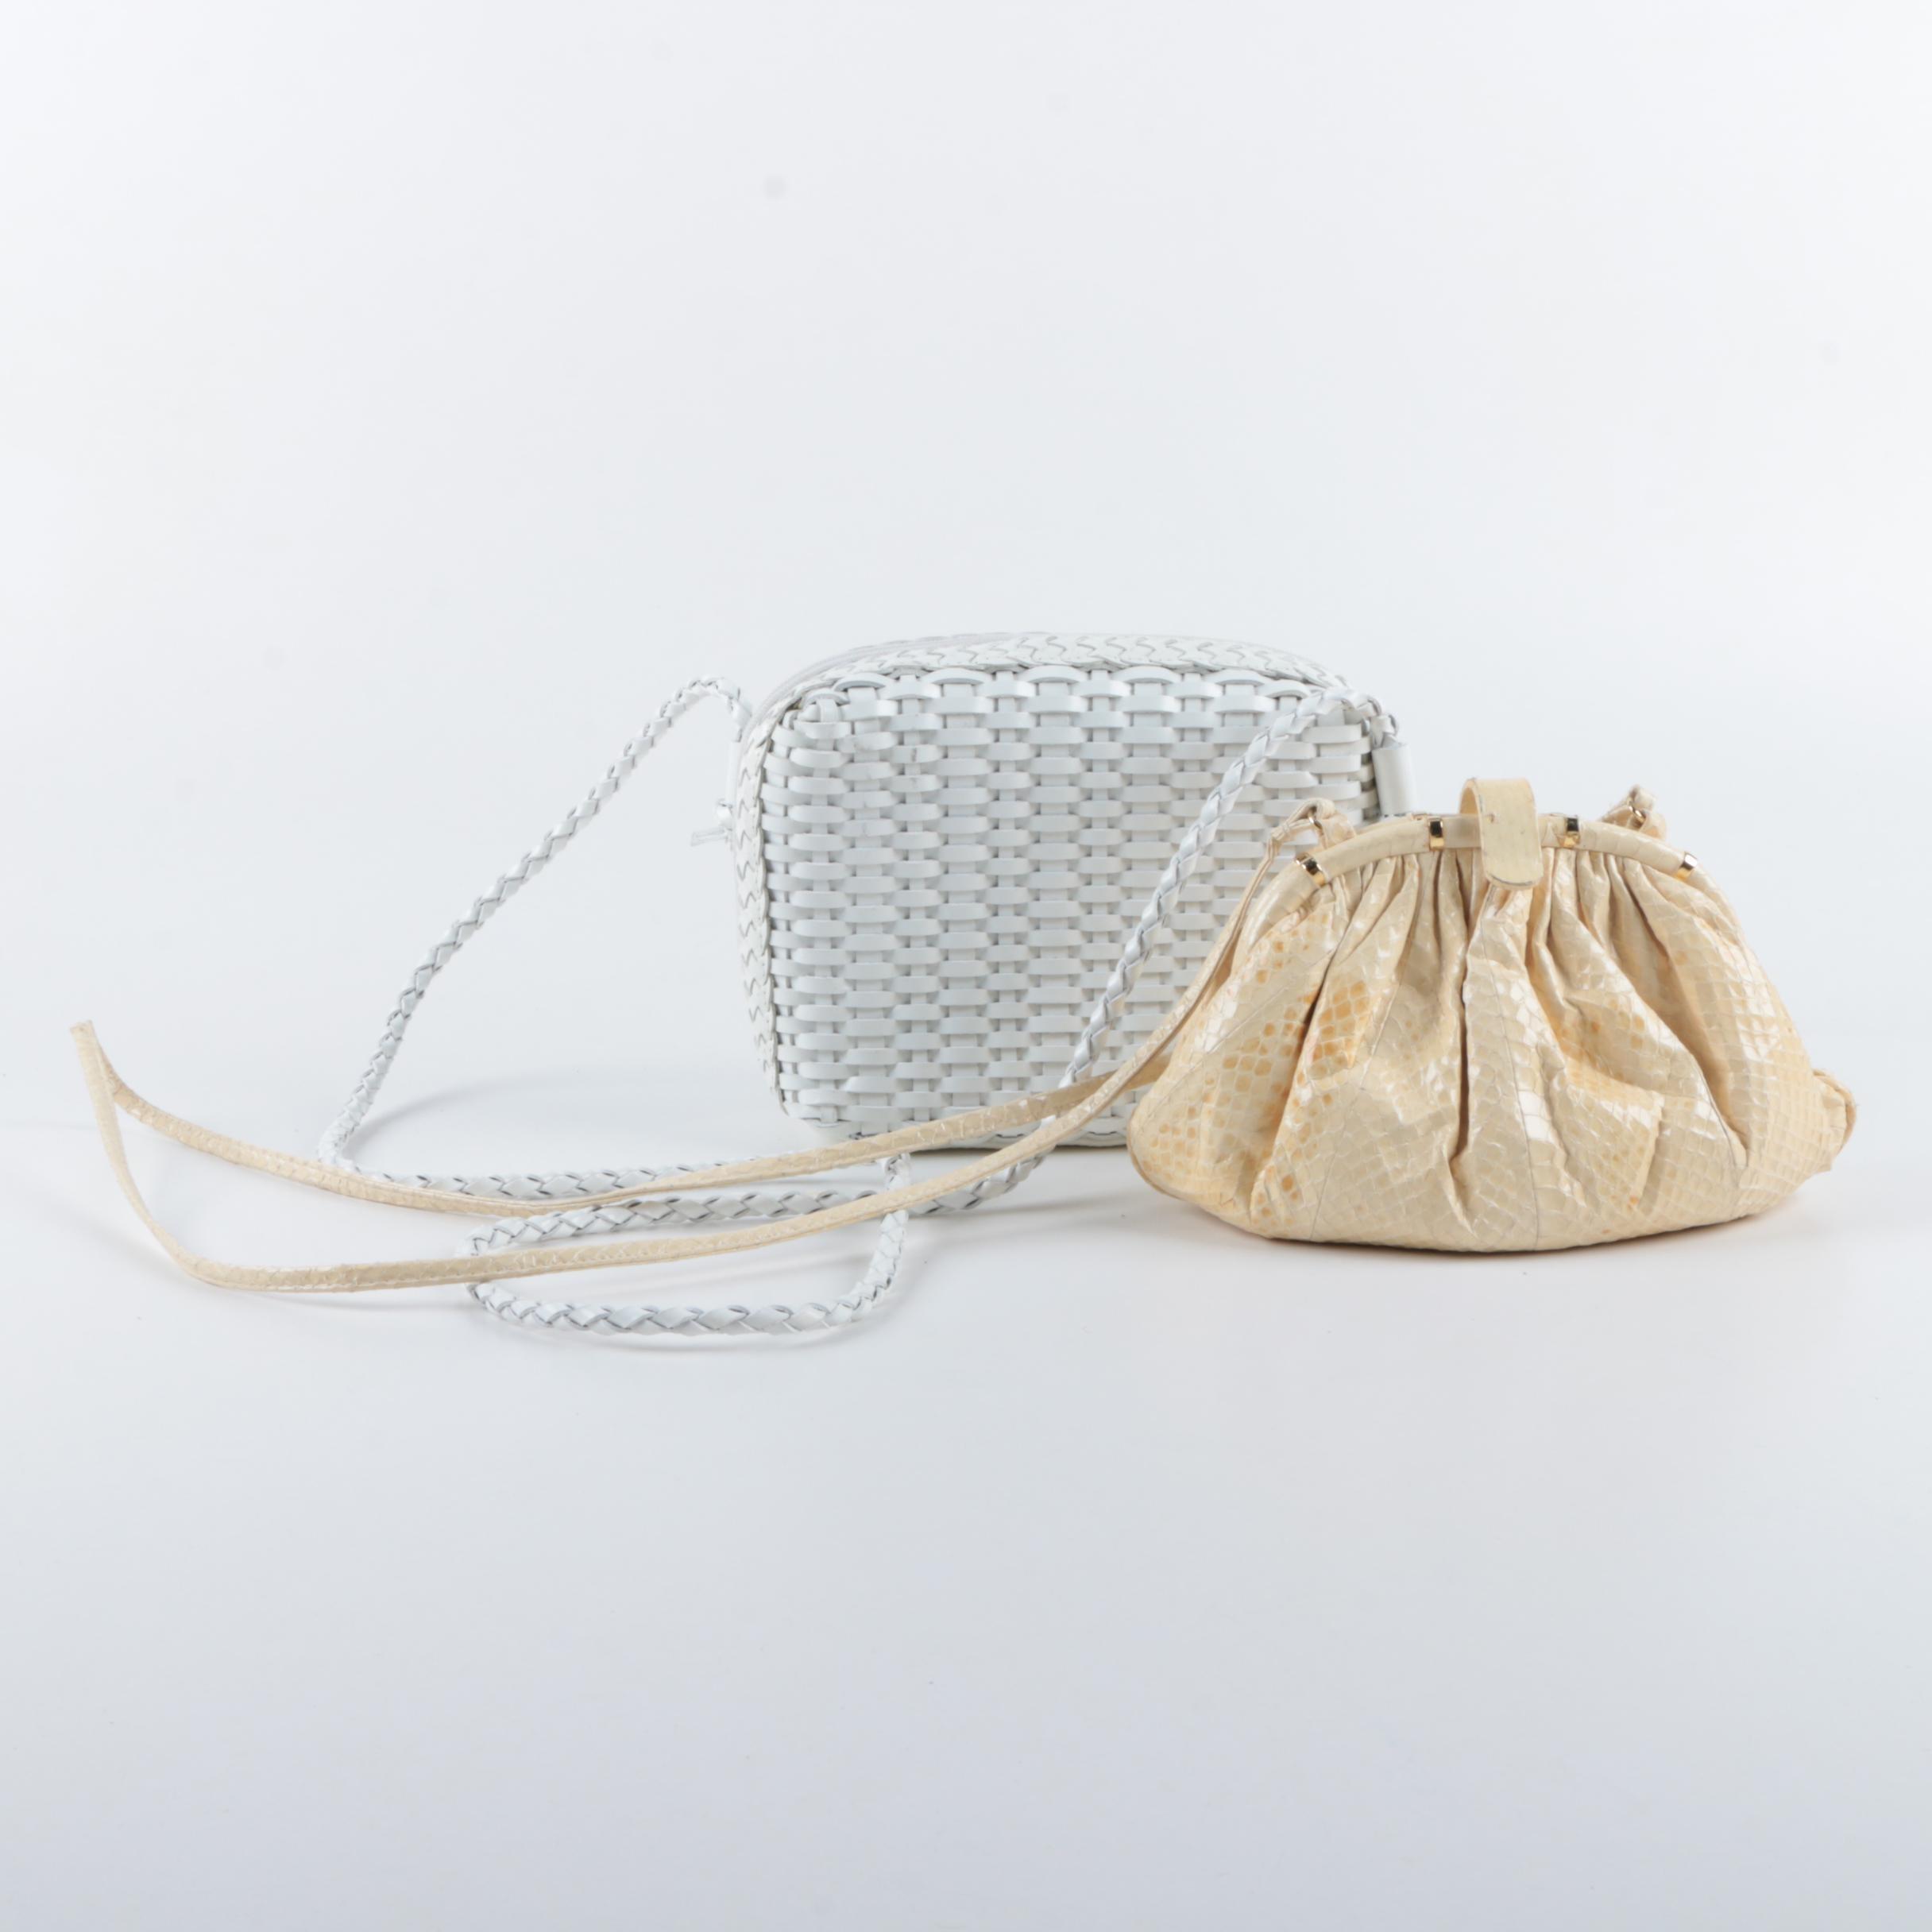 Small Leather Crossbody Handbags